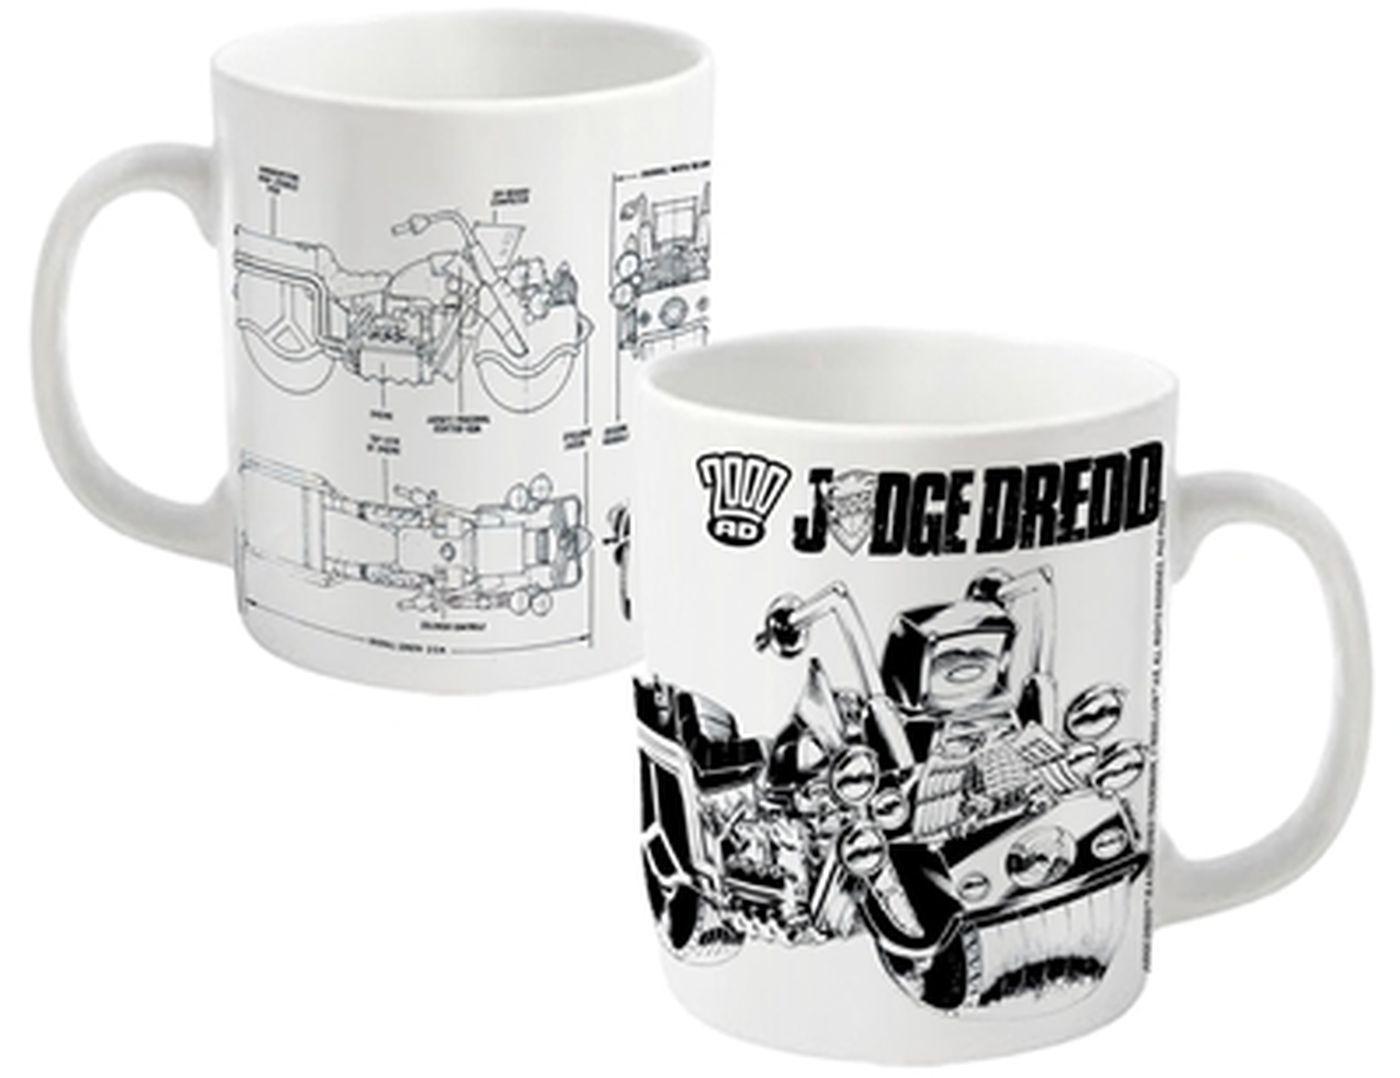 2000AD Judge Dredd Bike Schematics mug - Official - Something Geeky